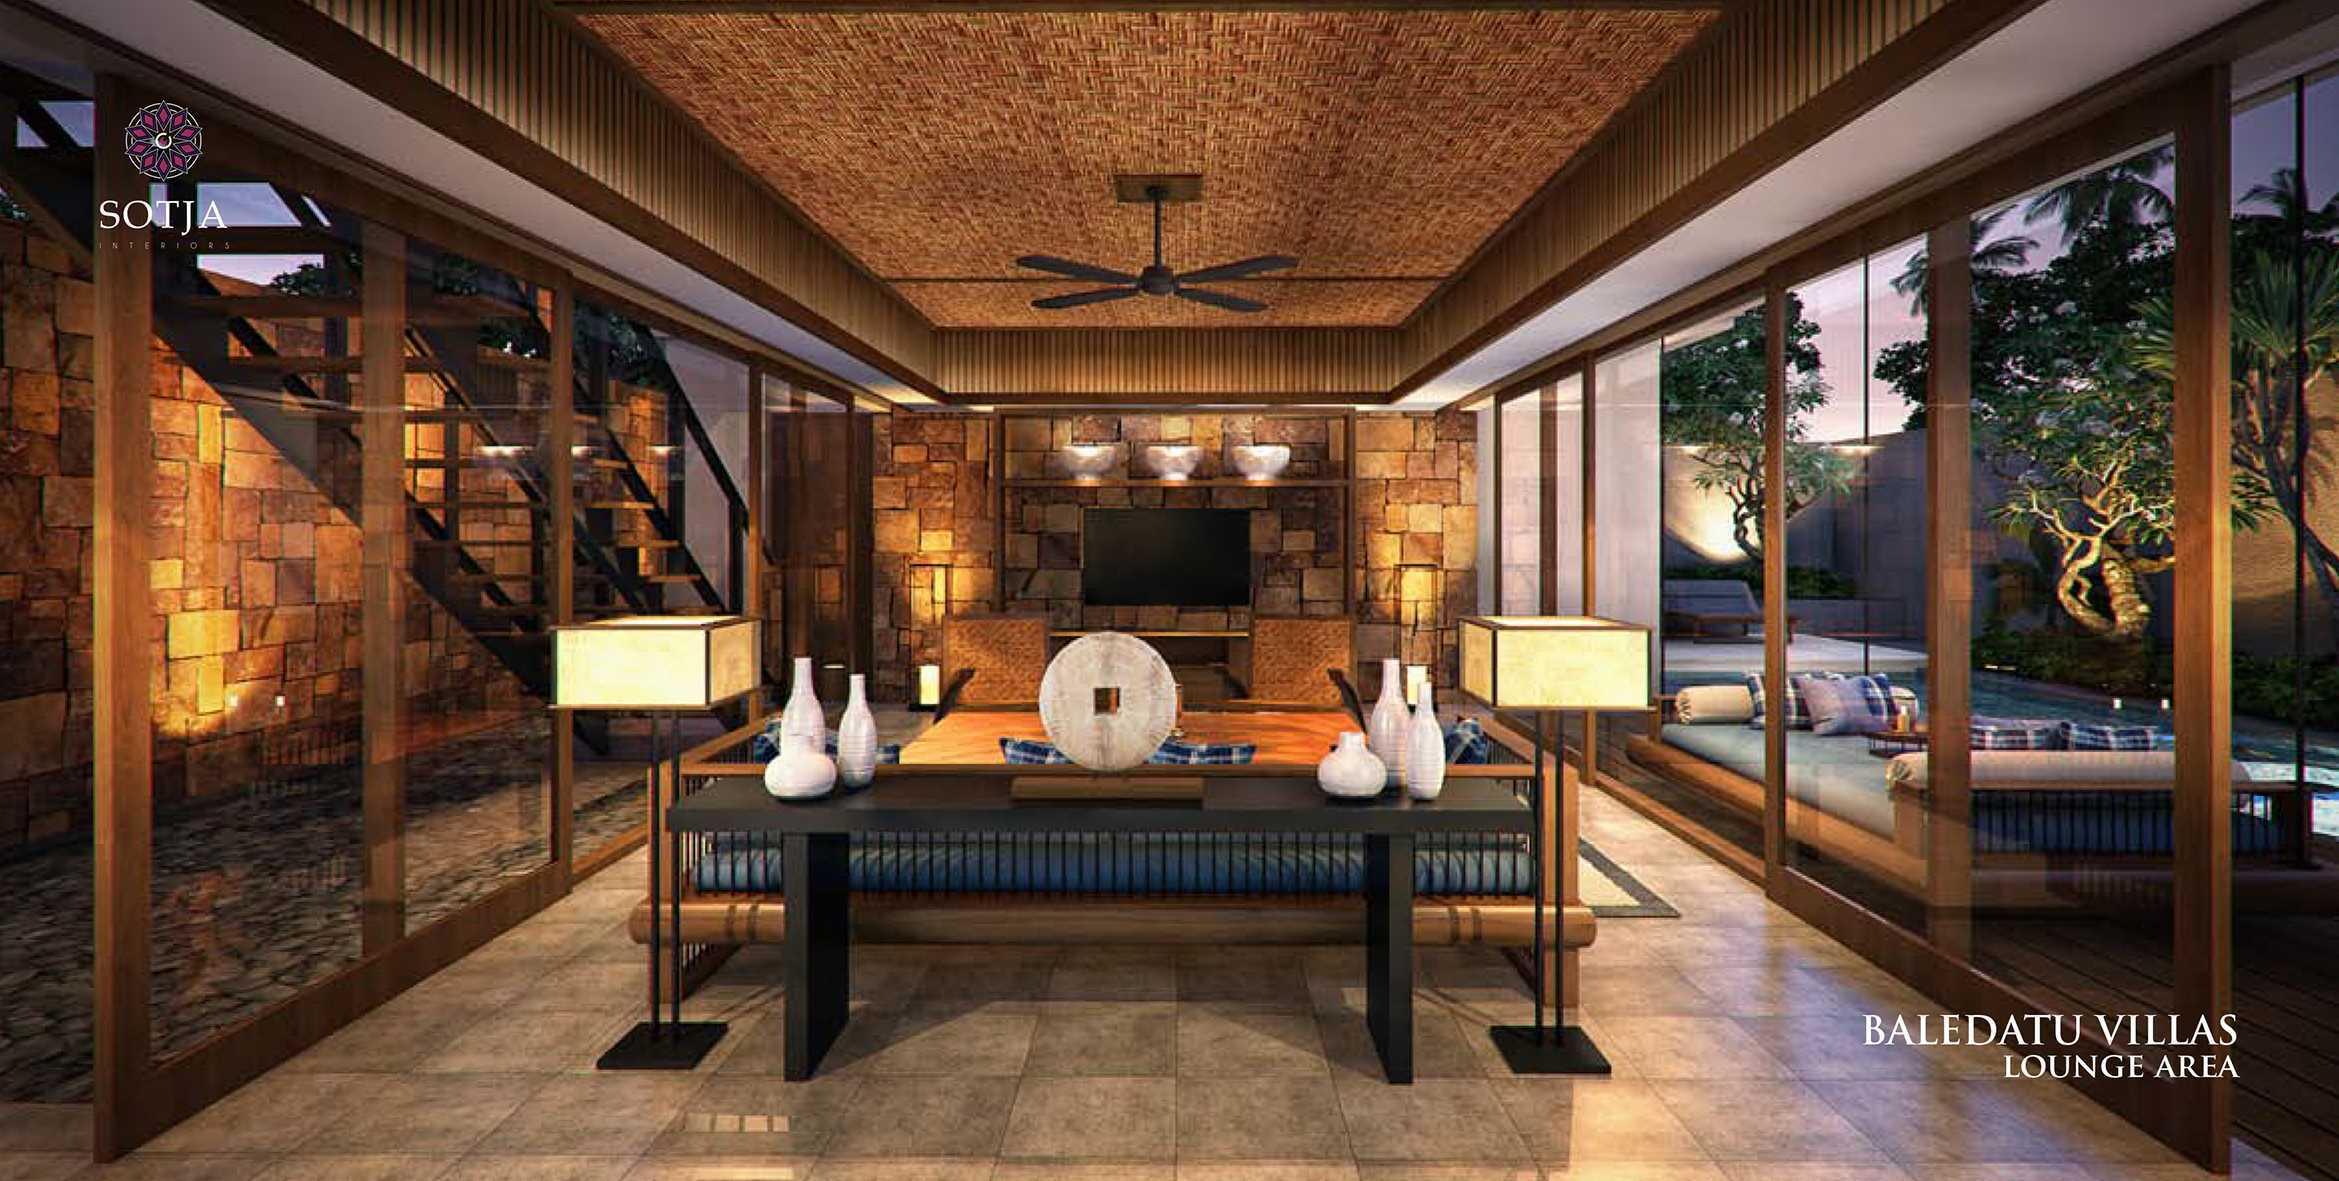 Sotja Interiors Baledatu Villas At Senggigi Lombok, Indonesia Lombok, Indonesia Lounge Area   9913